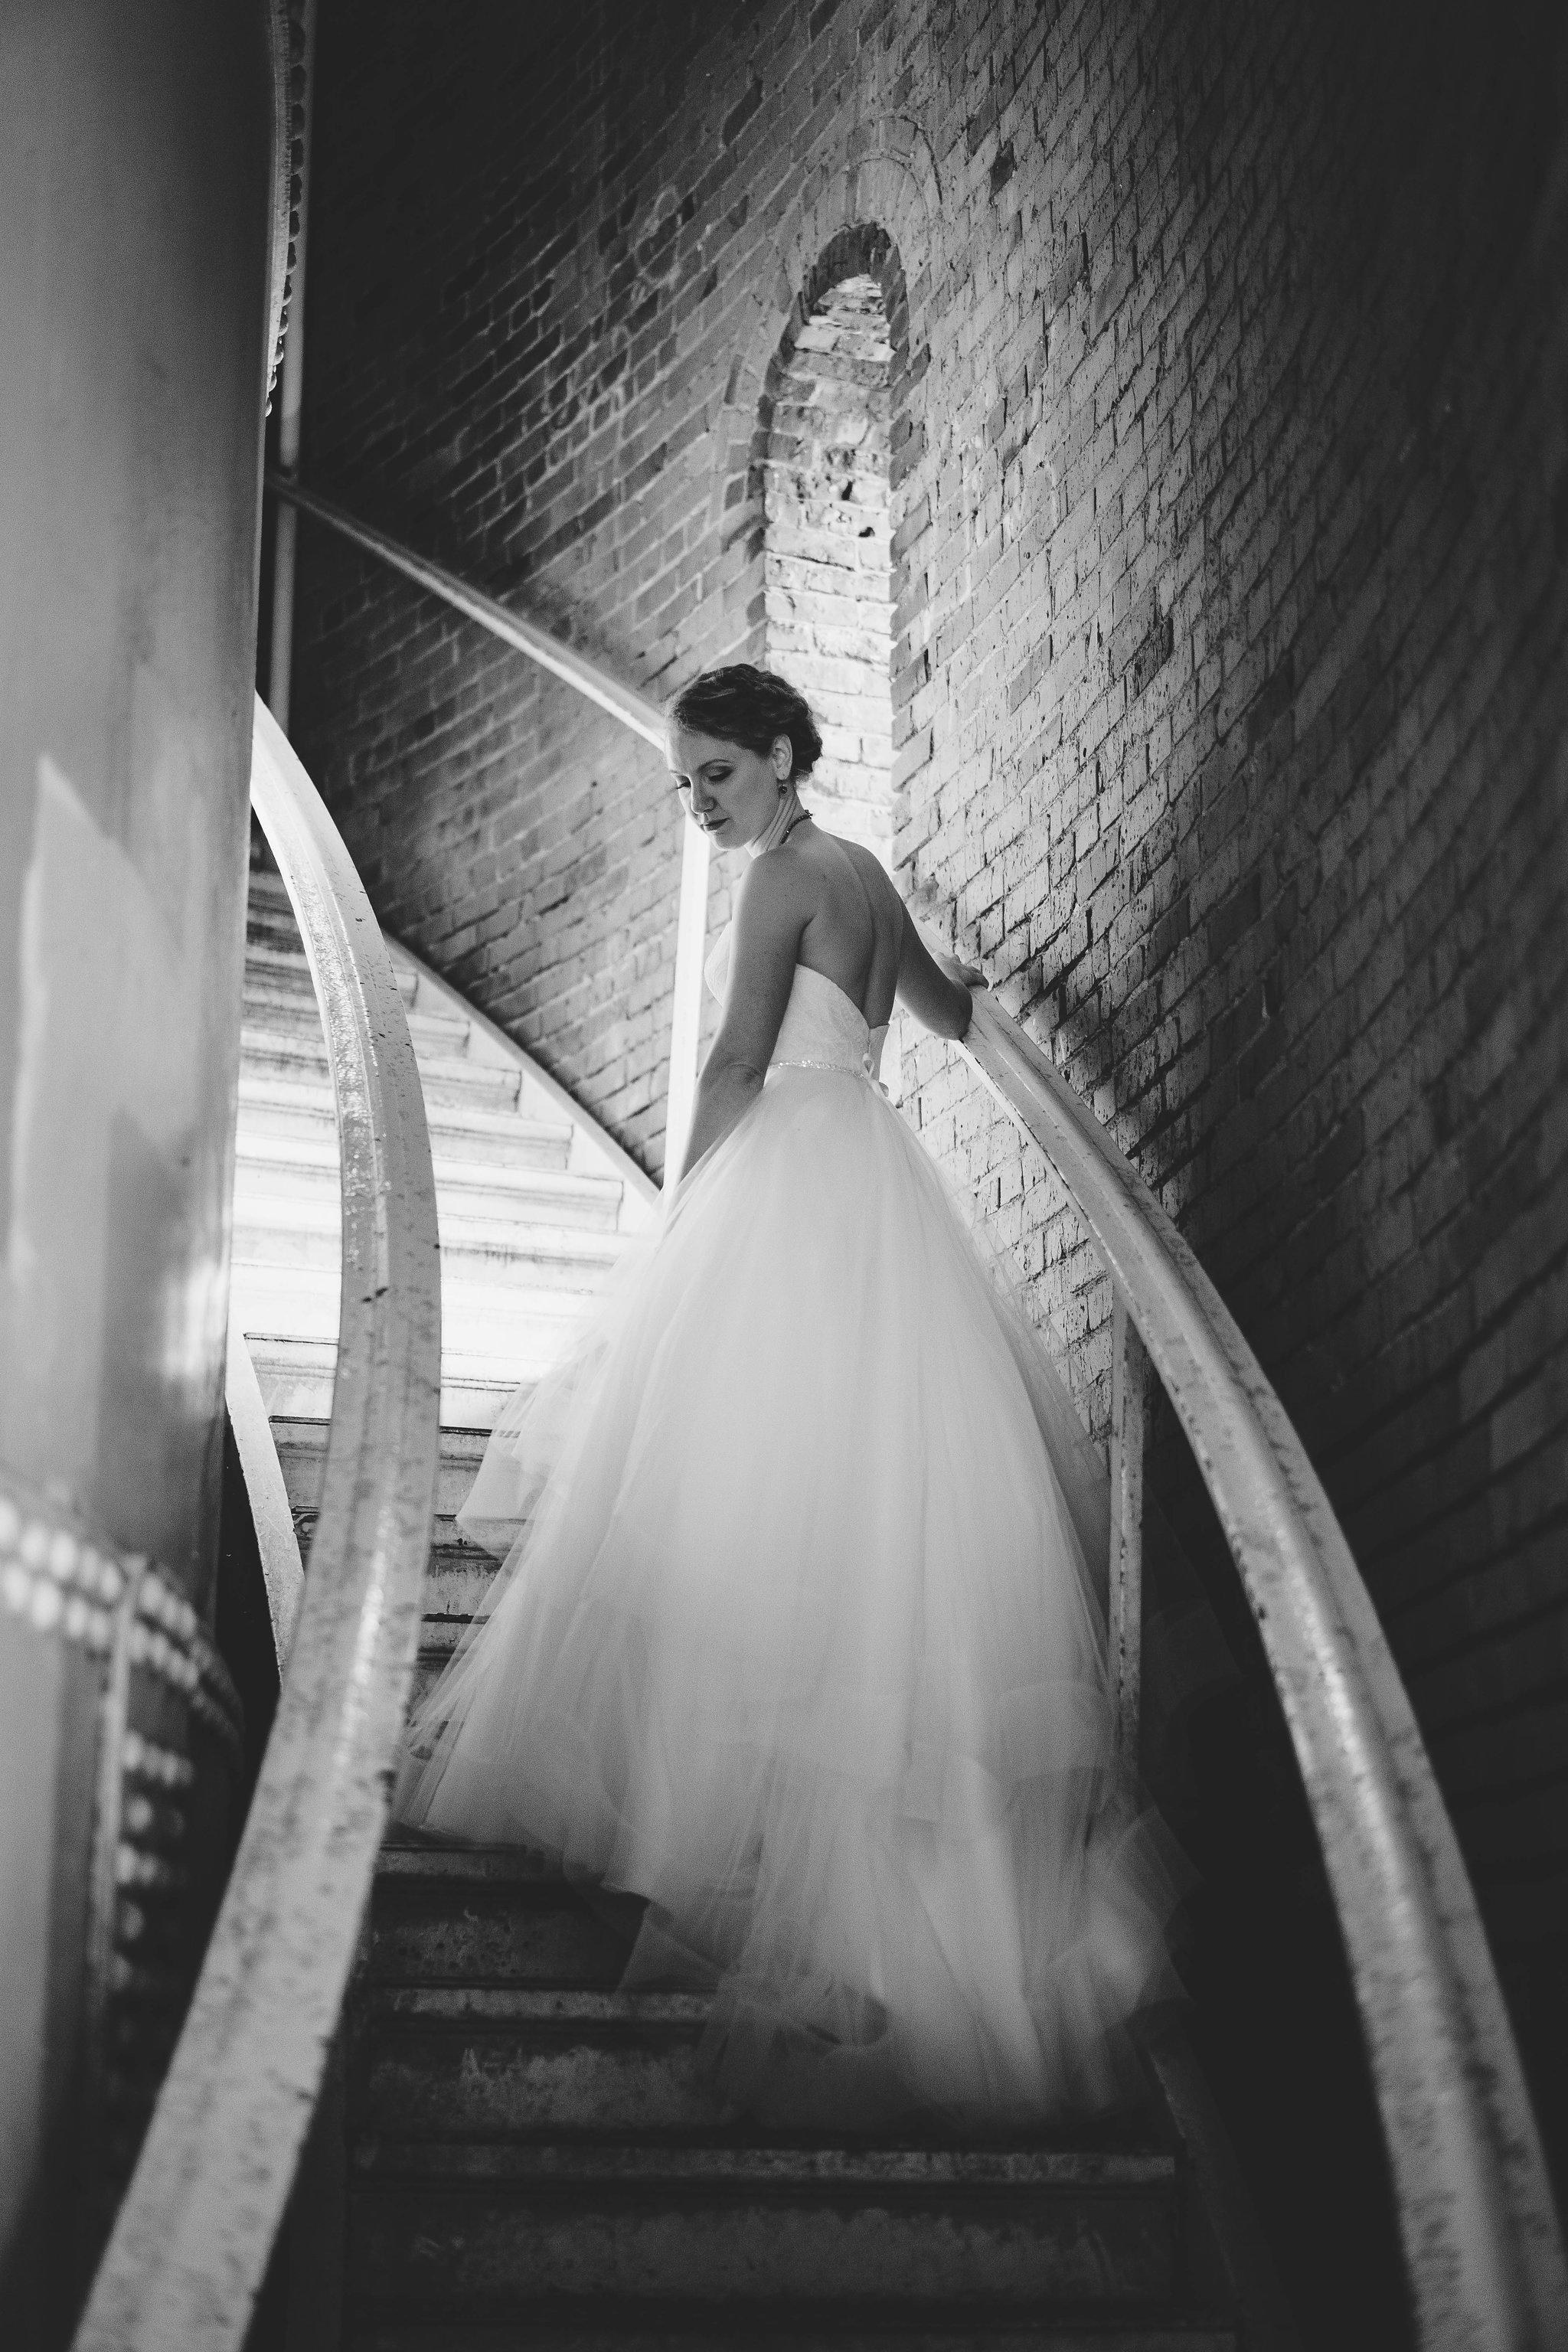 sole-repair-shop-wedding-capitol-hill-by-seattle-wedding-photographer-adina-preston-3.jpg